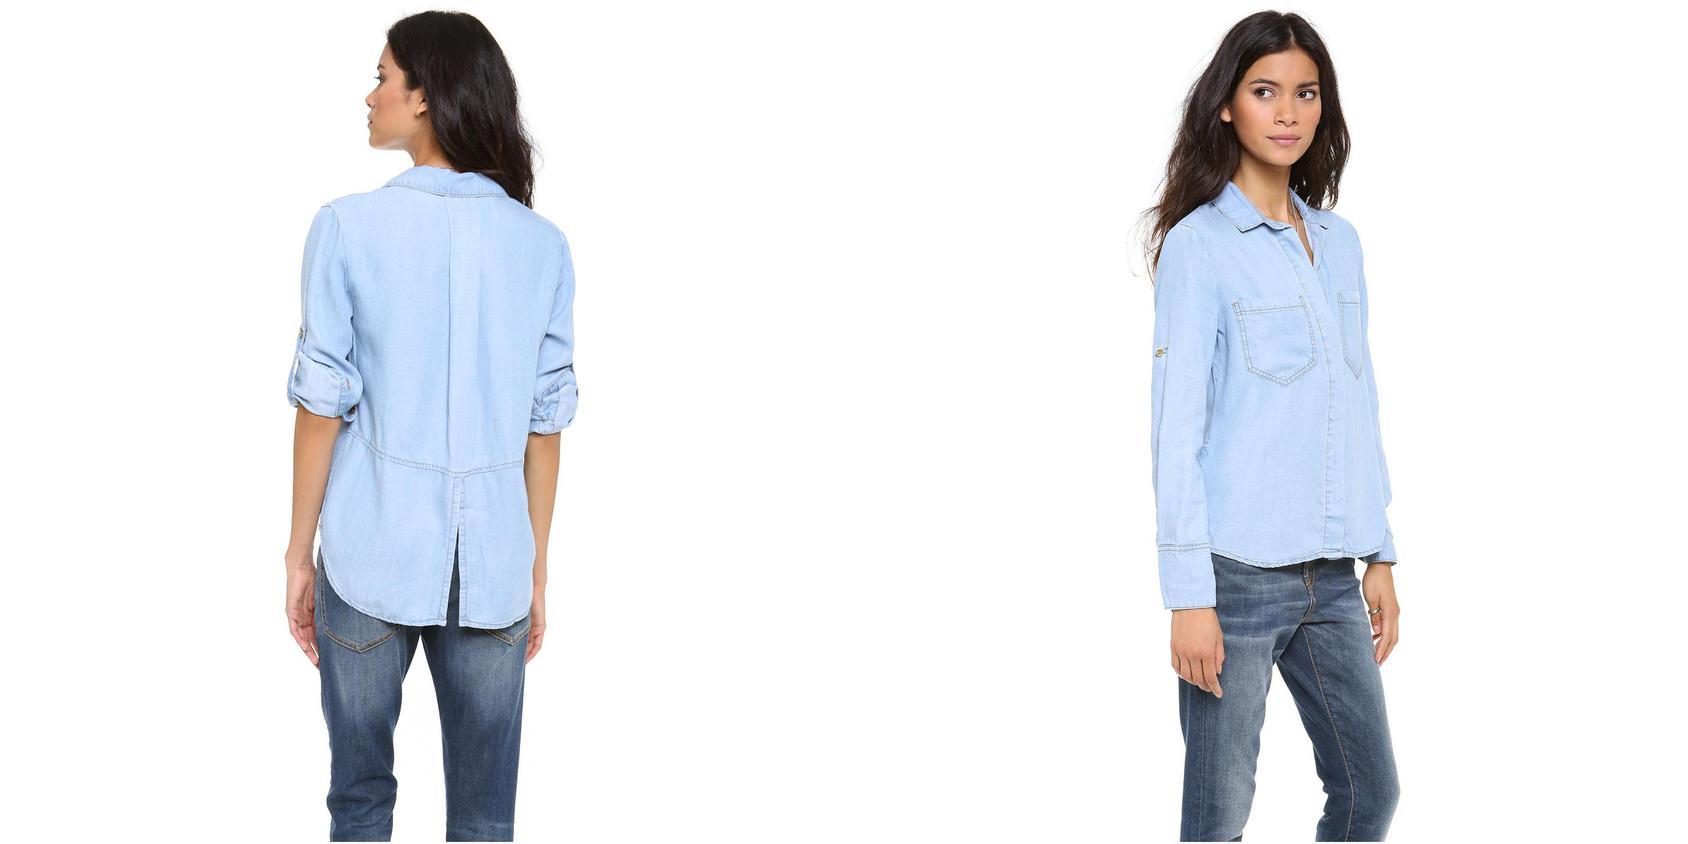 Camasi dama Burberry, Calvin Klein si Columbia disponibile pe ShopAlert